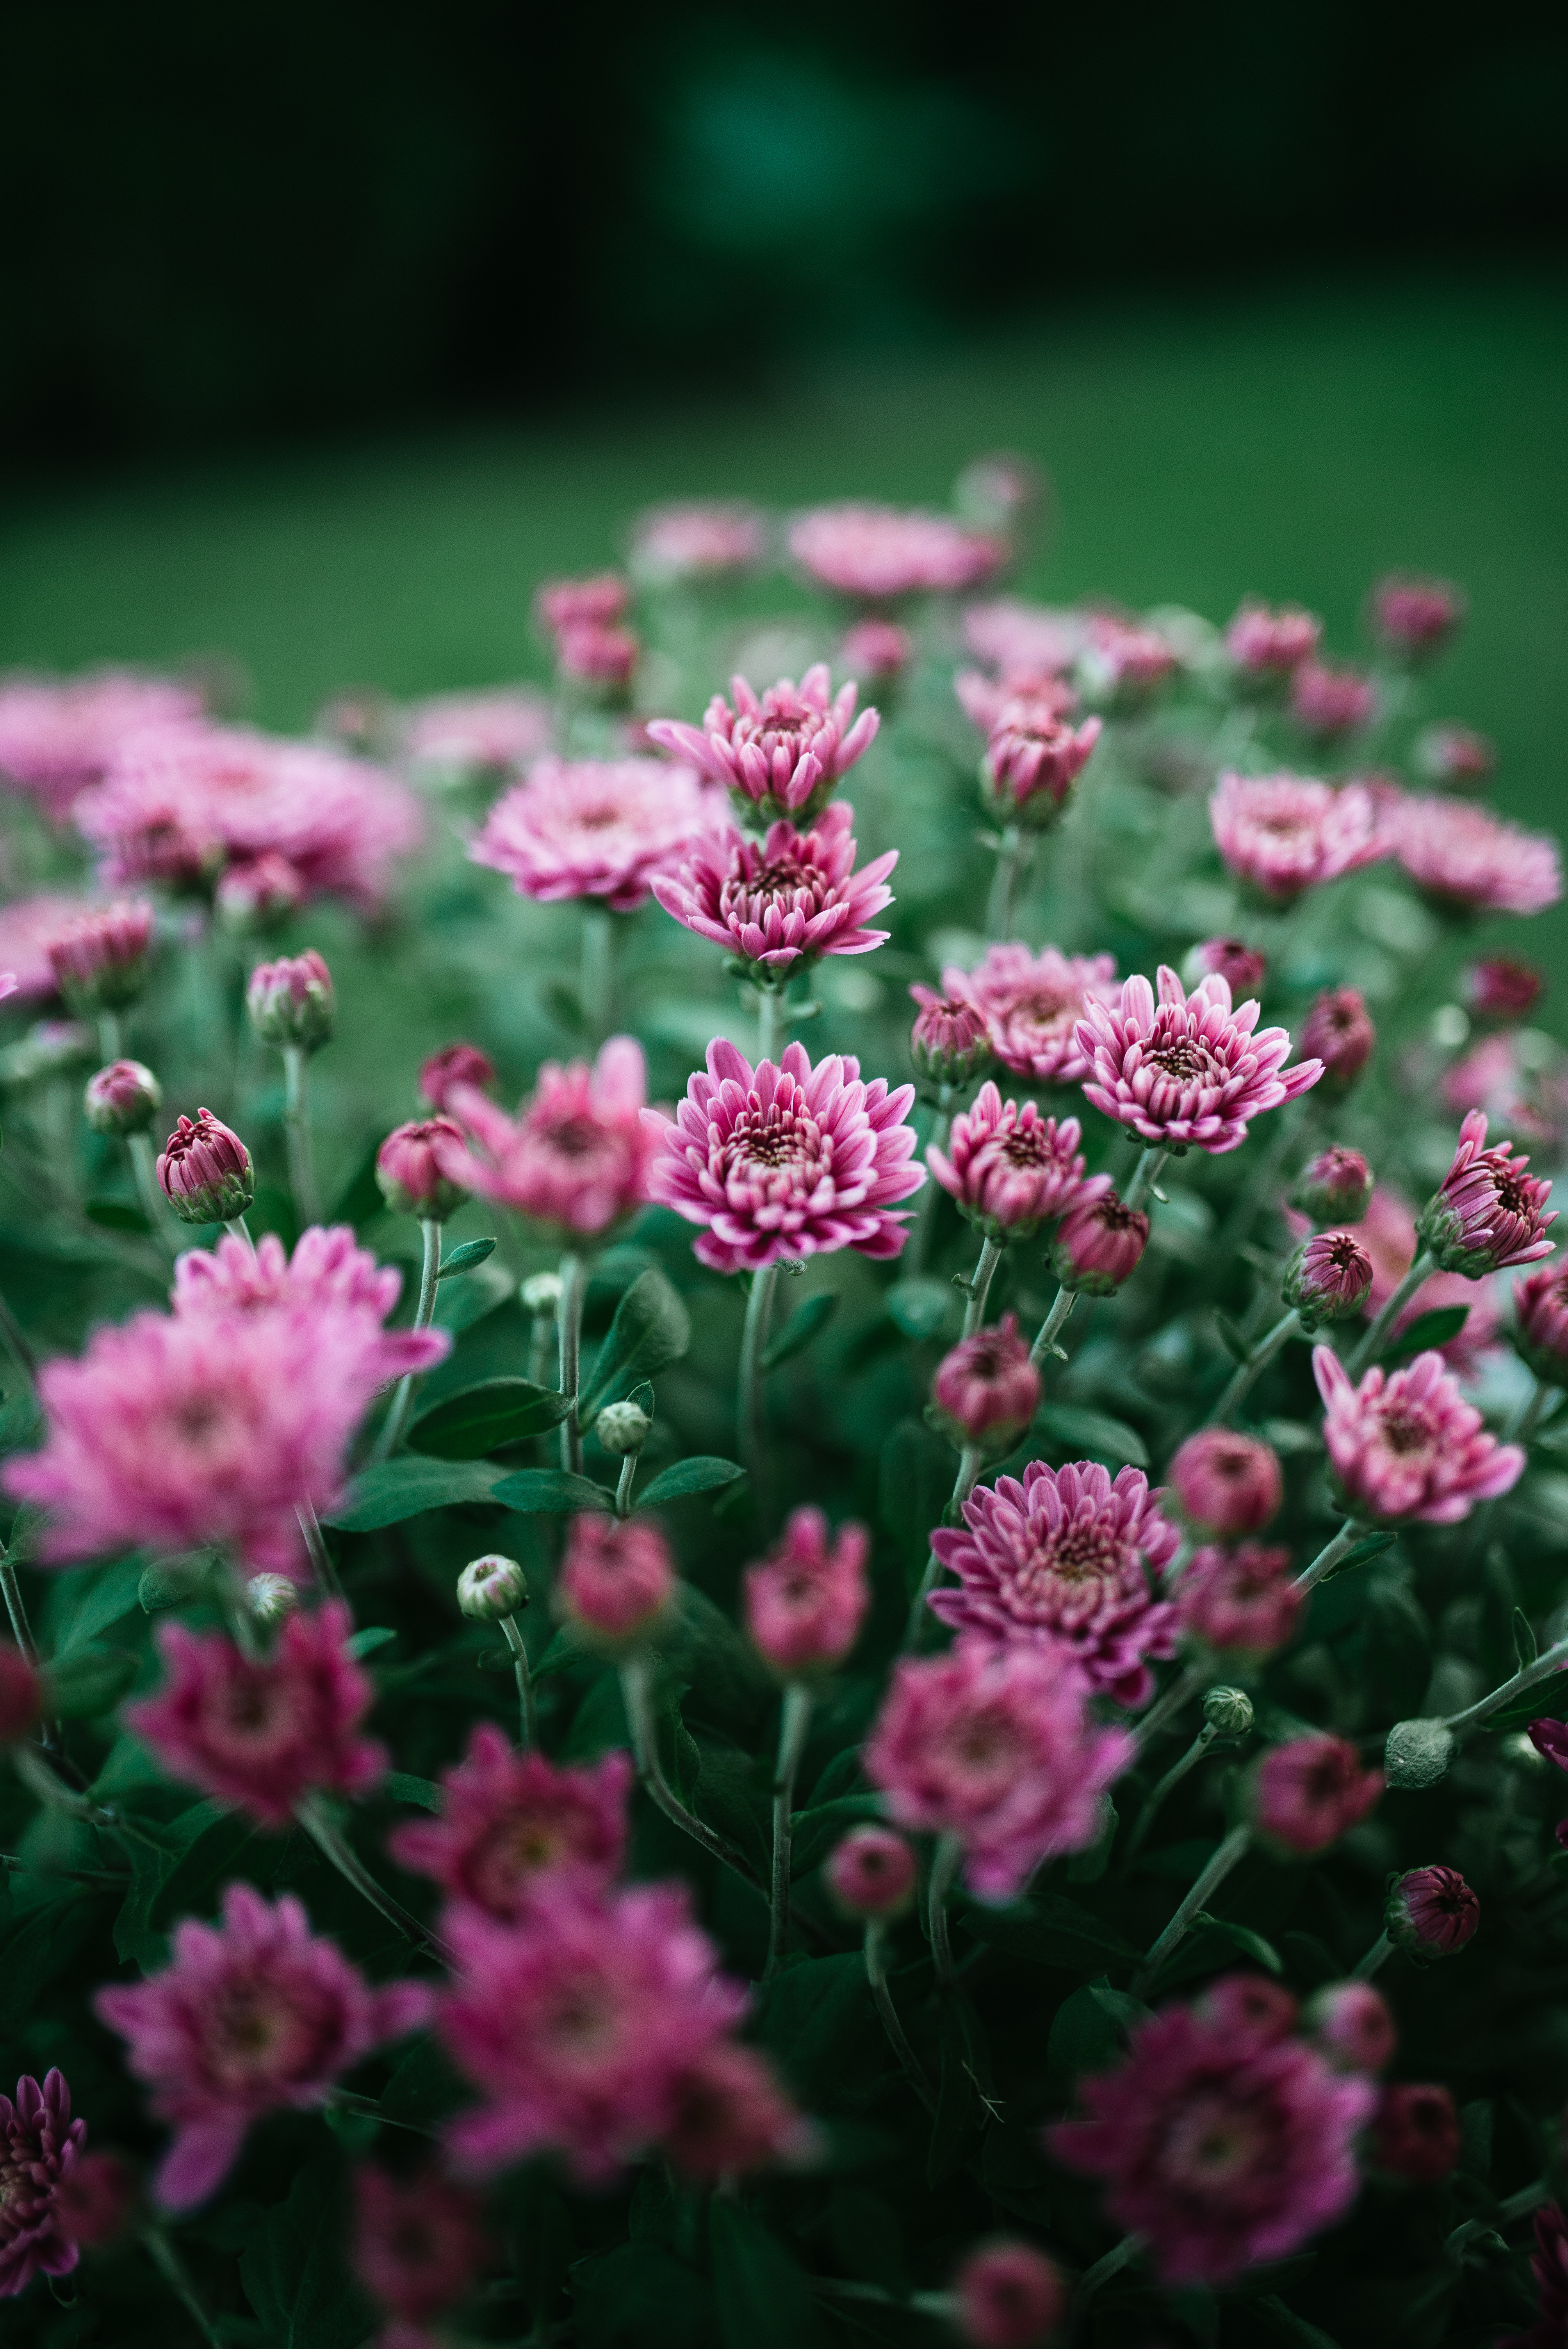 54827 download wallpaper Flowers, Chrysanthemum, Flower, Bloom, Flowering, Purple, Violet screensavers and pictures for free